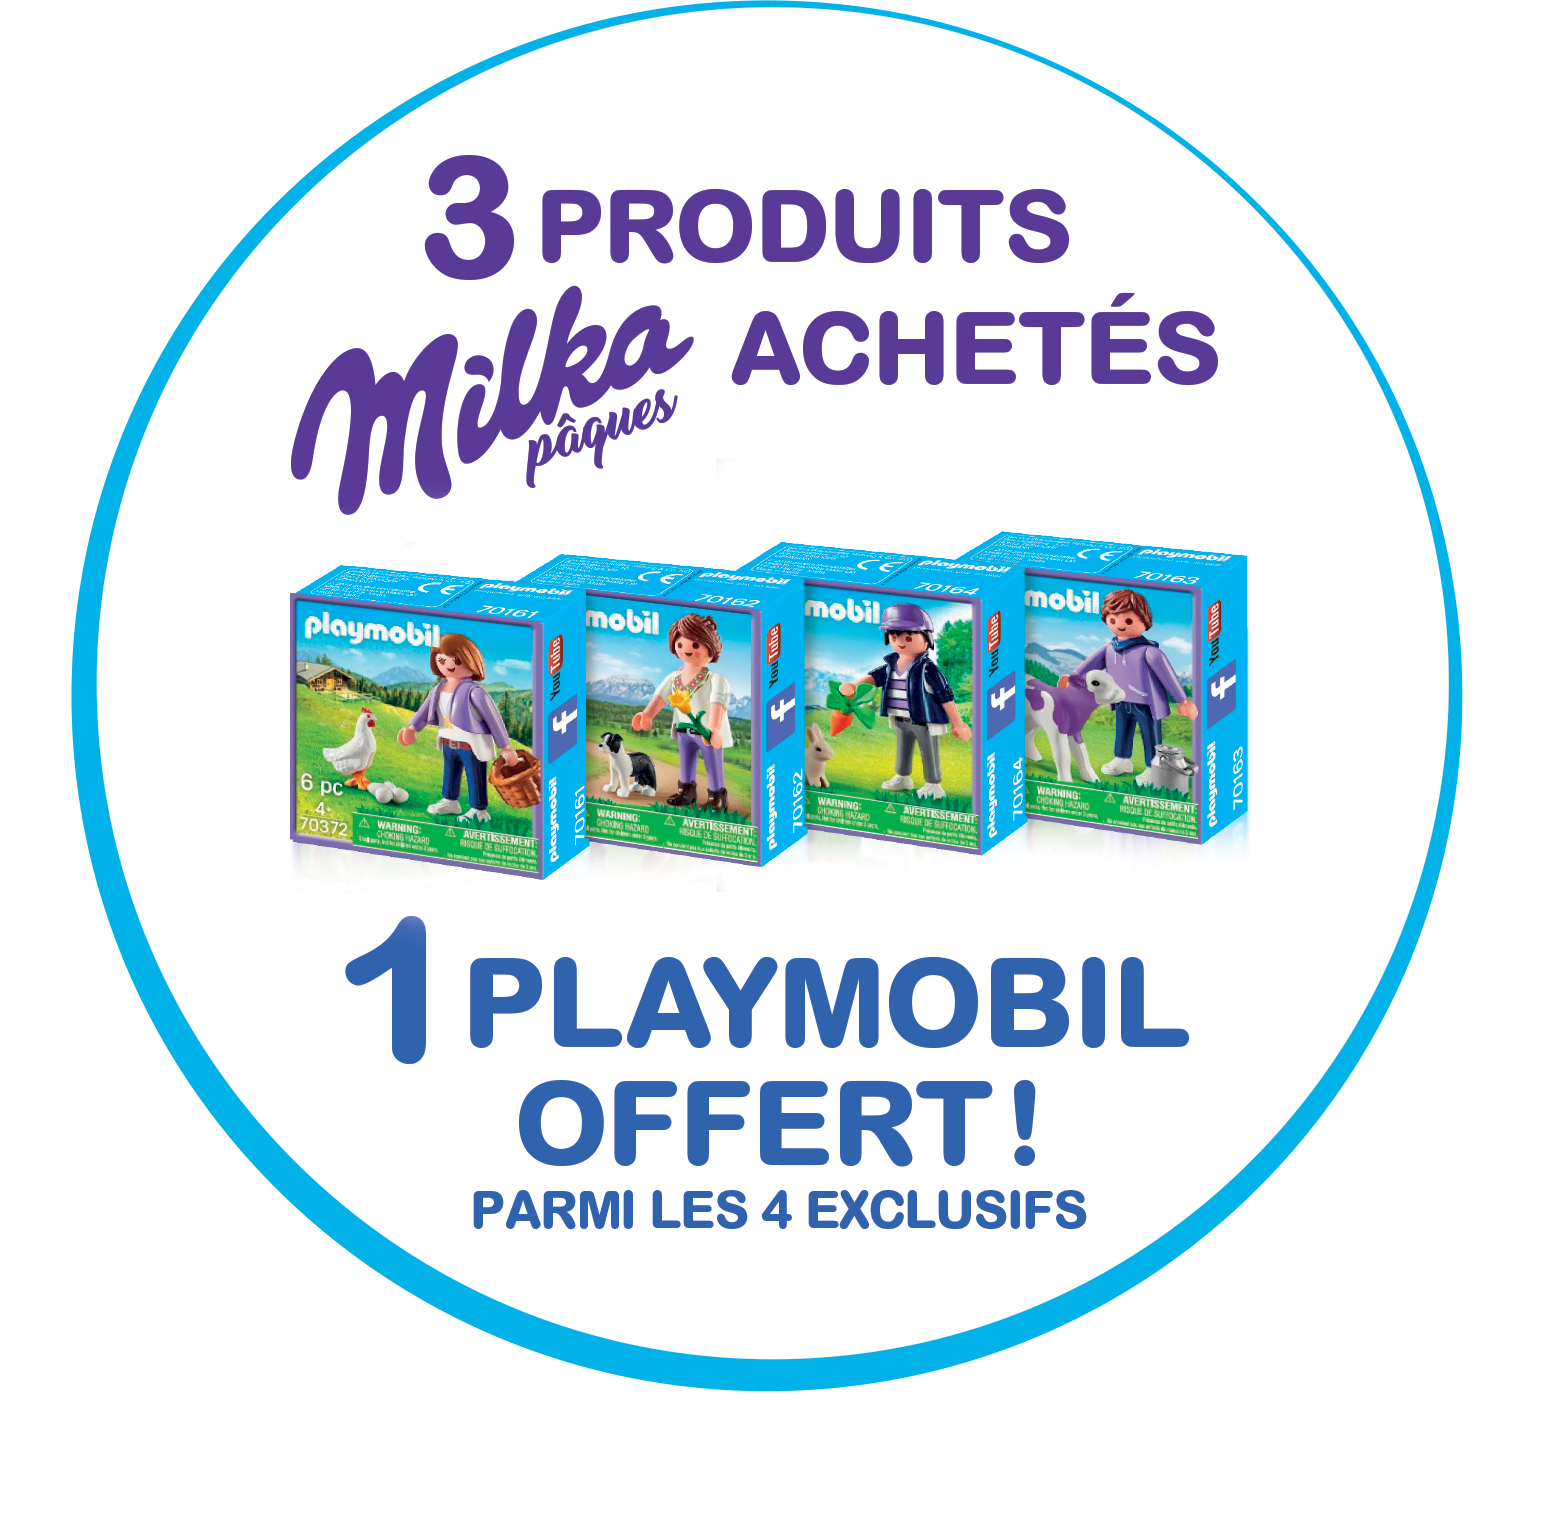 Code promo Milka : 3 produits Mika achetée = une boite de Playmobil offerte